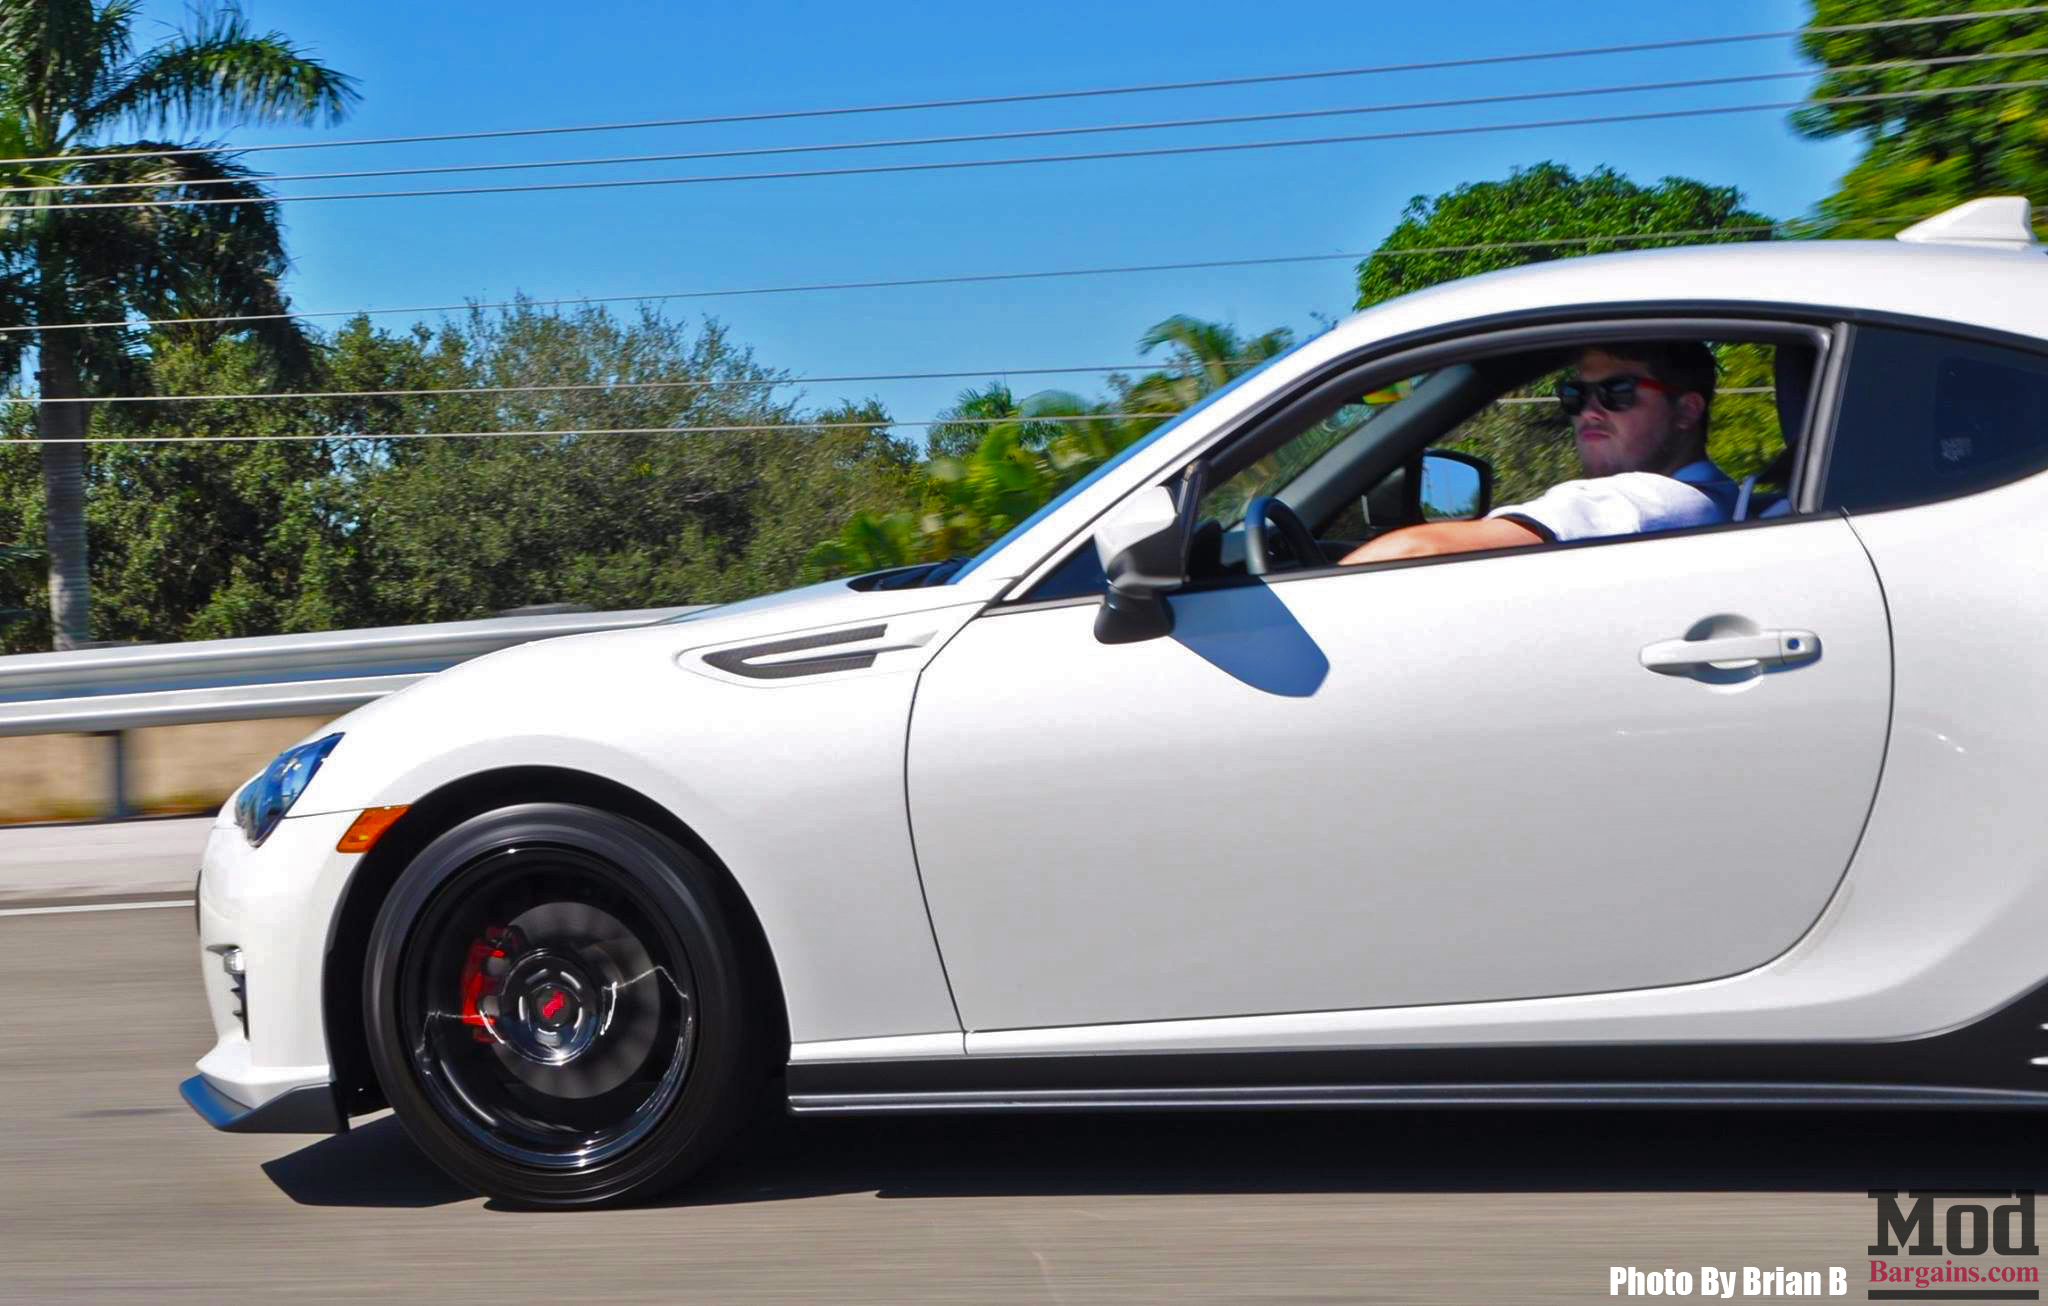 Valenti Tail Lights For Subaru BRZ/Scion FR-S Review